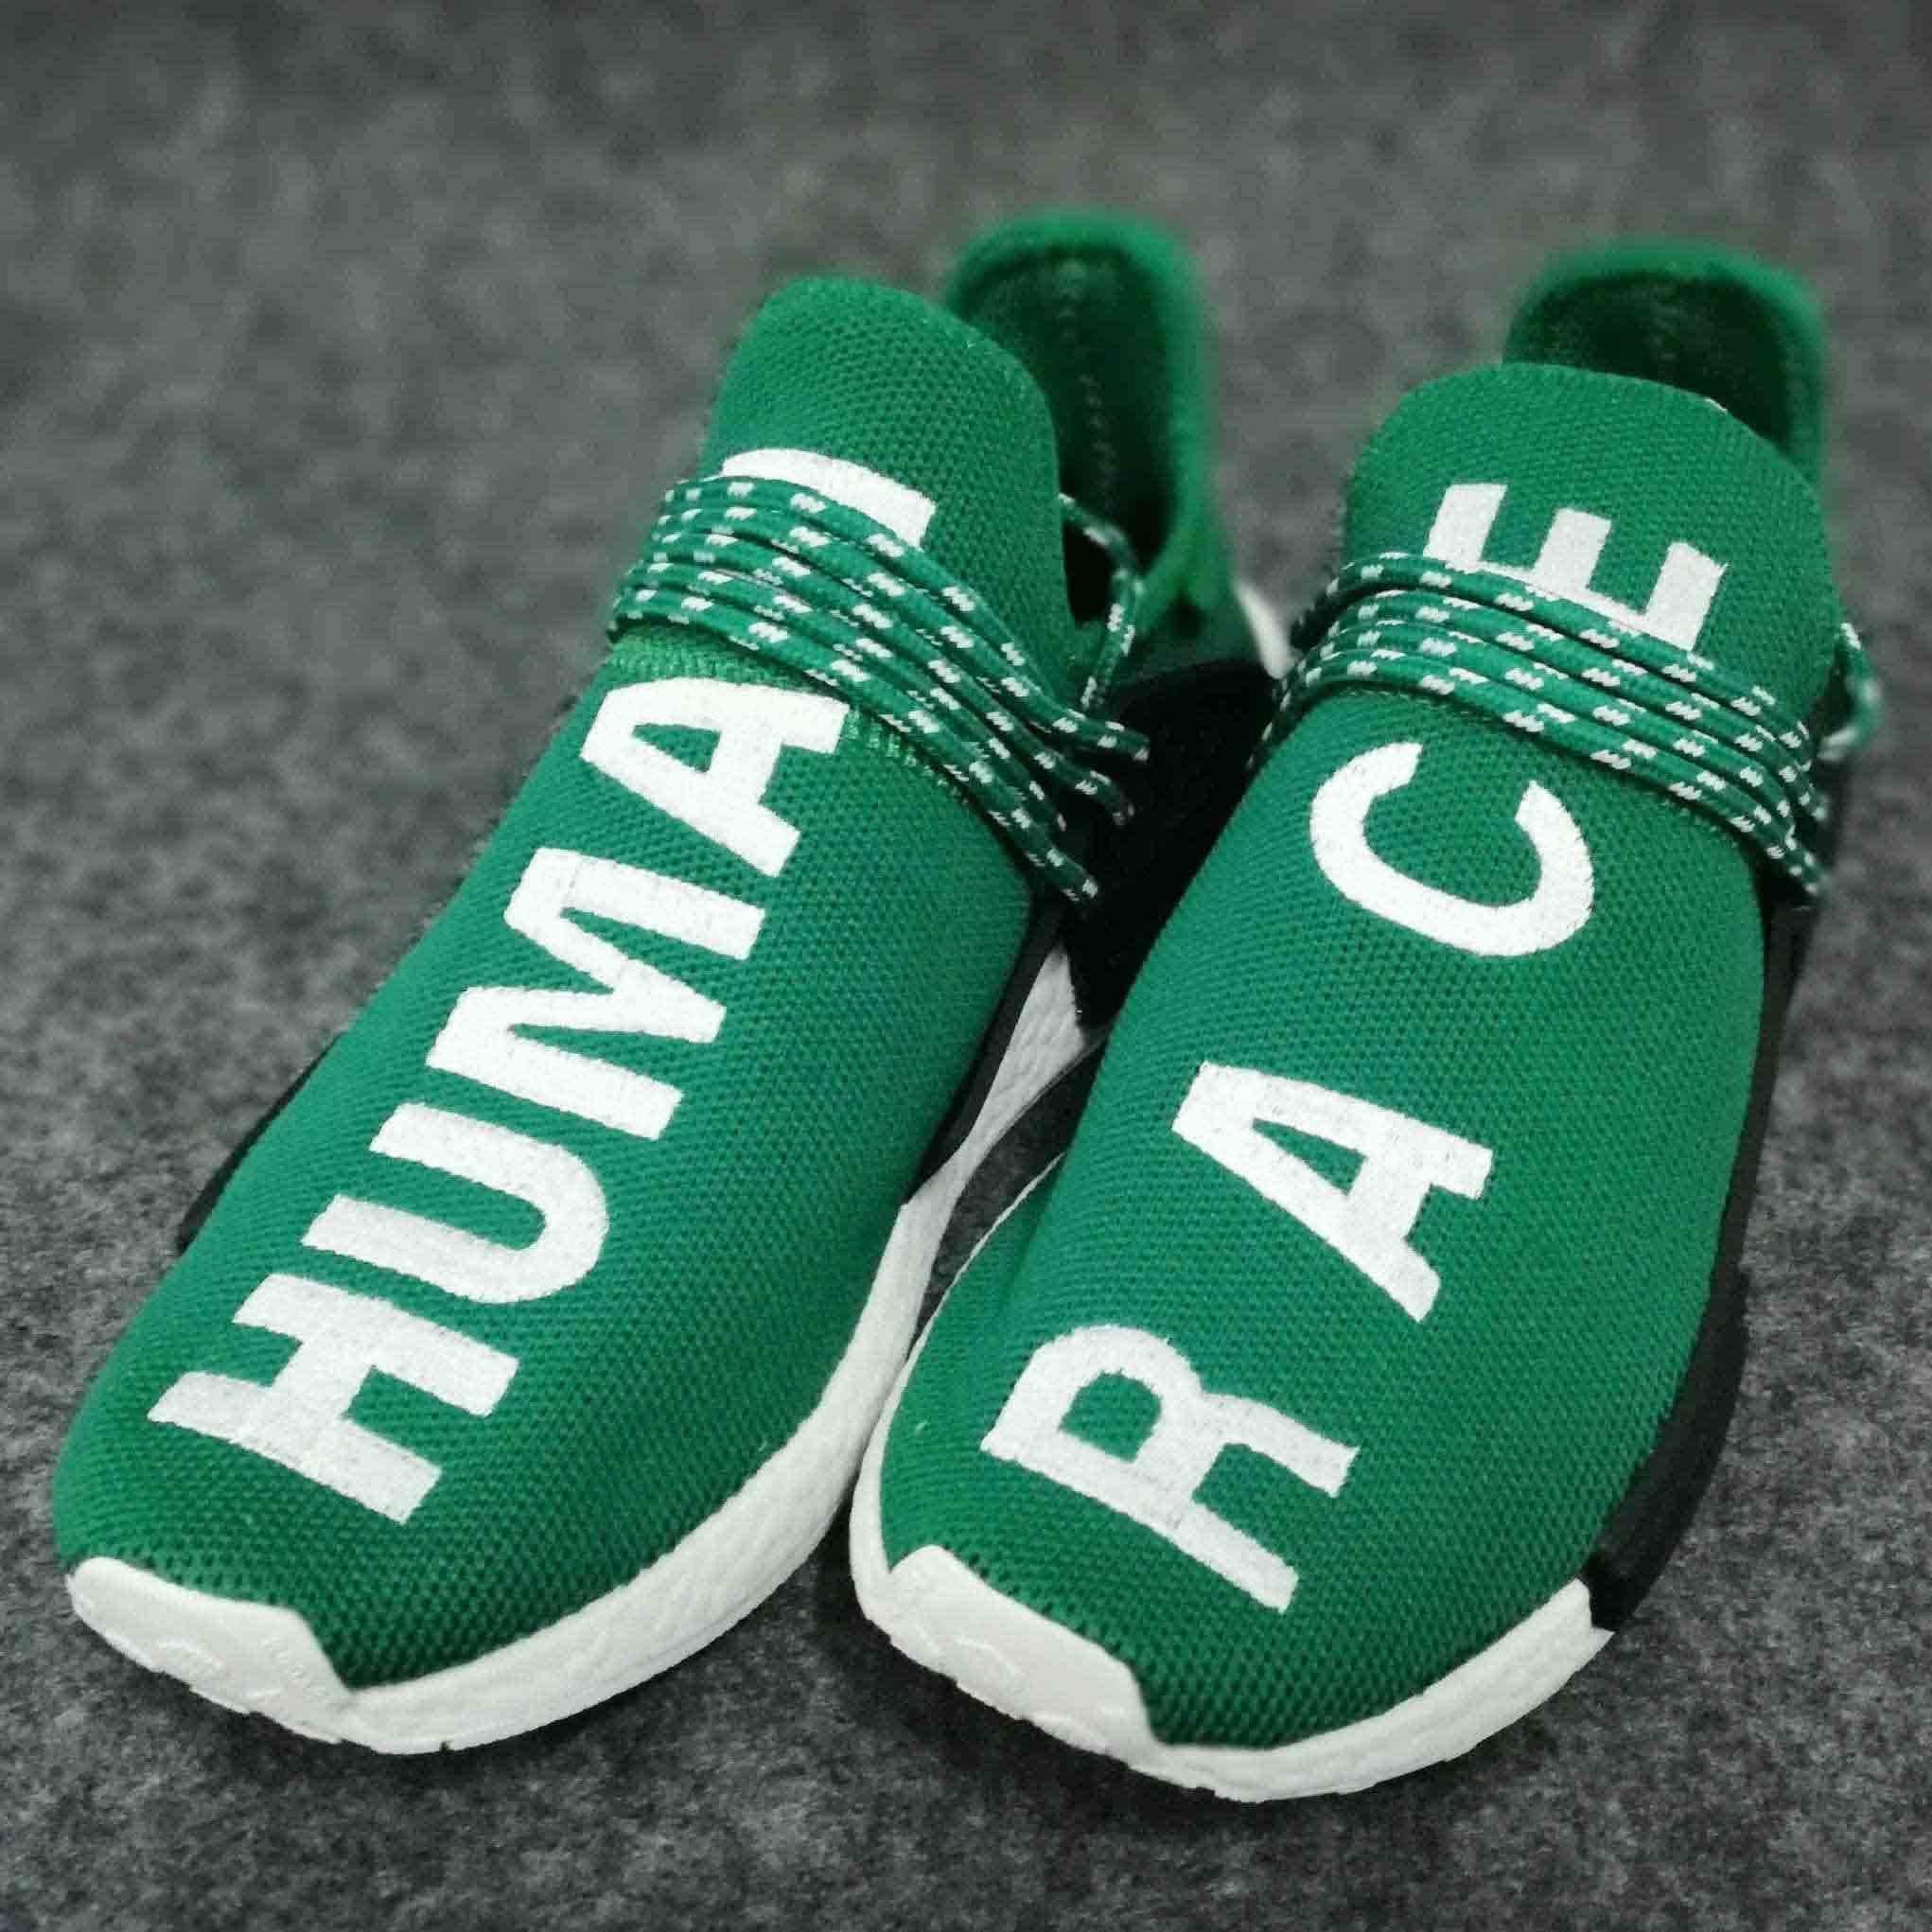 d983a21b13 2019 2018 New Color Human Race Factory Real Yellow Red Green Black Orange  Men Women Pharrell Williams X Human Race Damping Running Shoes From  Muxin2018